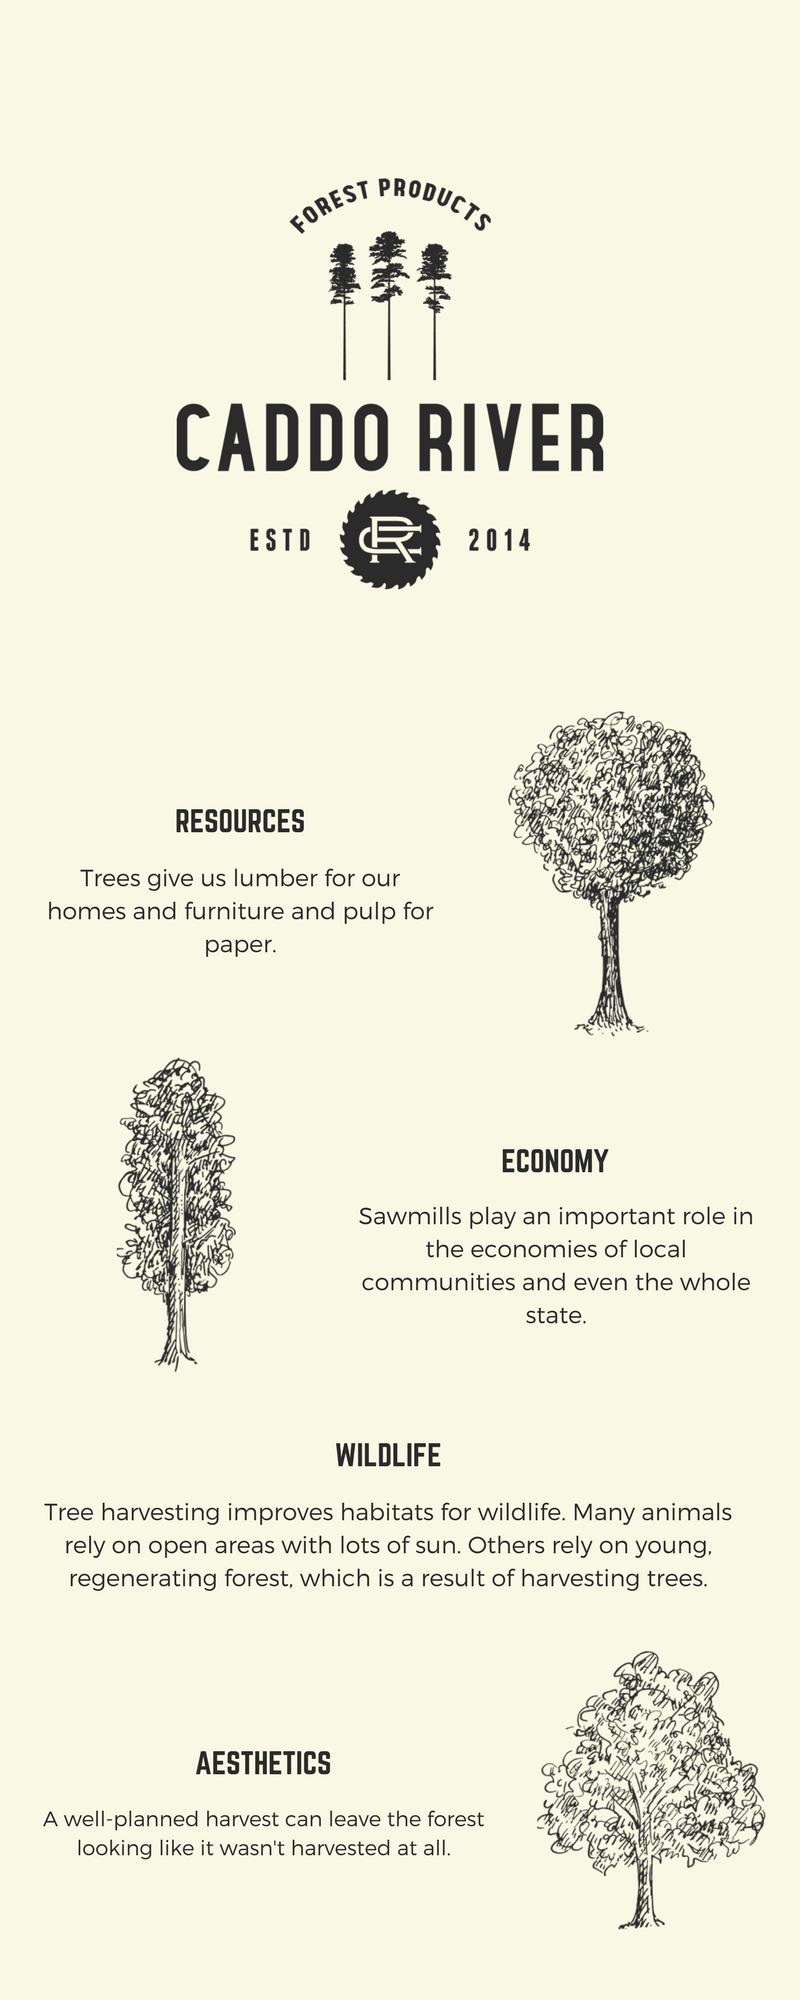 harvesting-trees